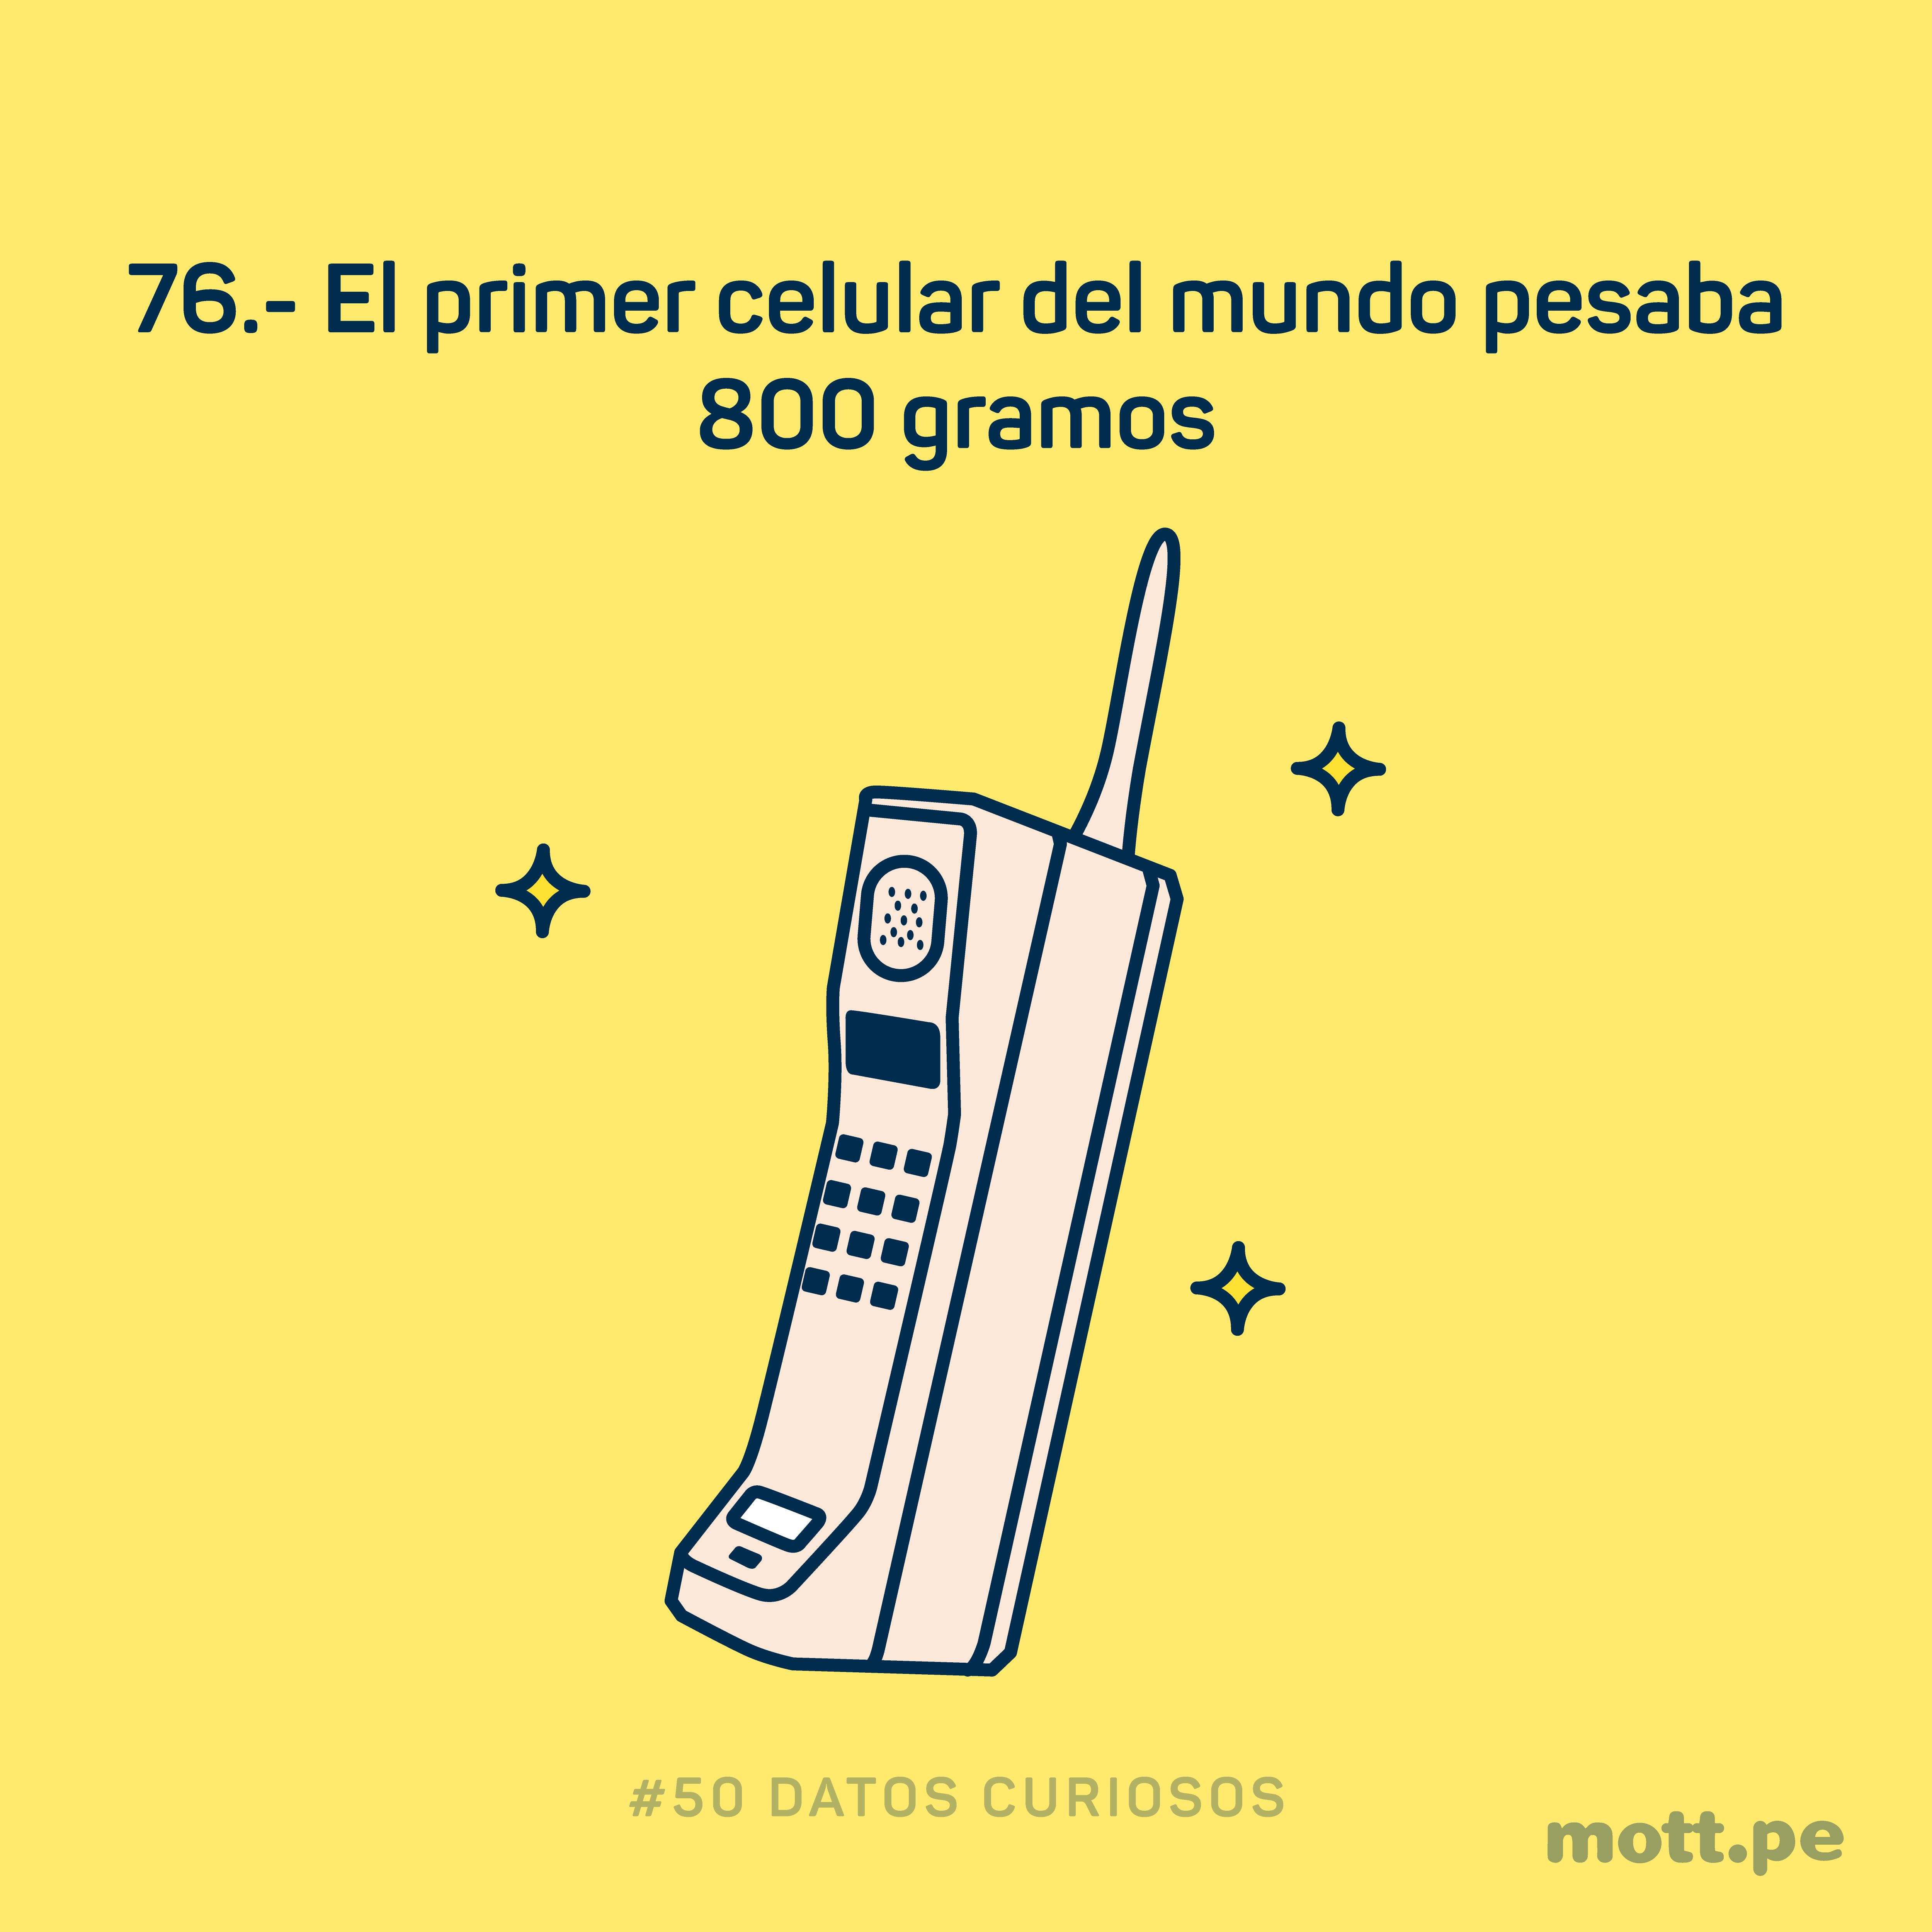 el primer celular peso 800 gramos